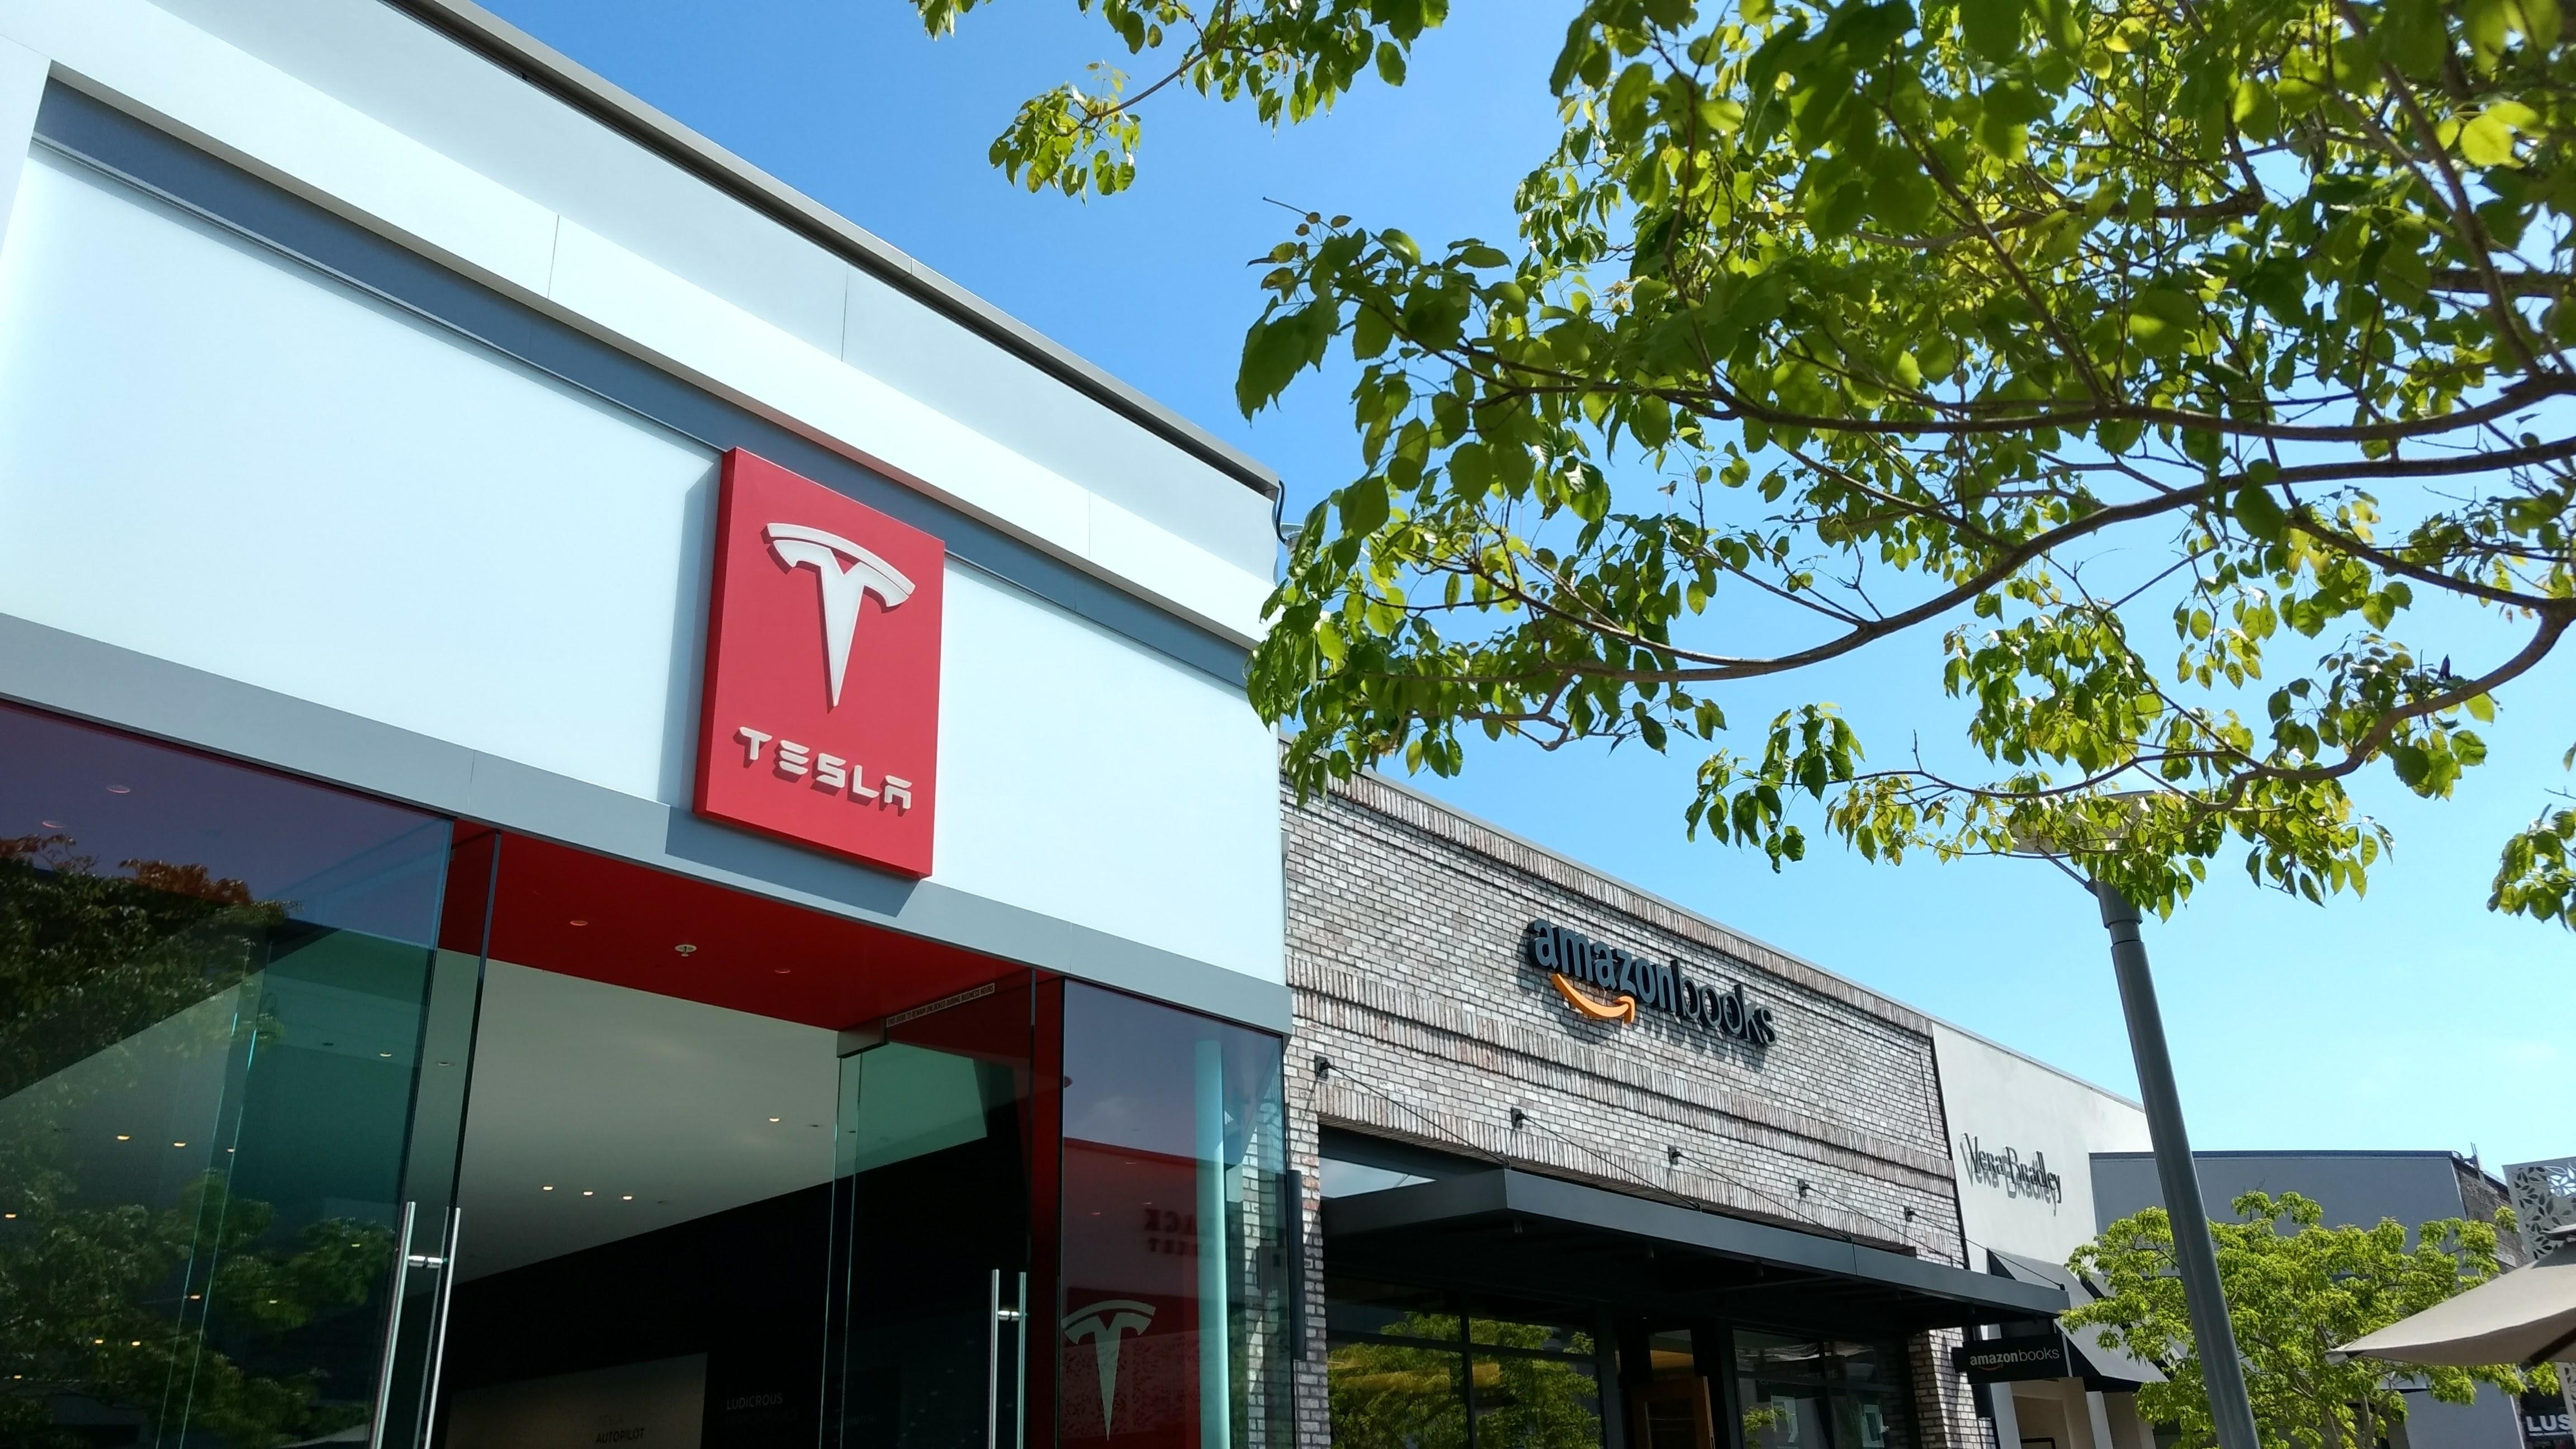 storefronts of Tesla showroom and Amazon bookstore